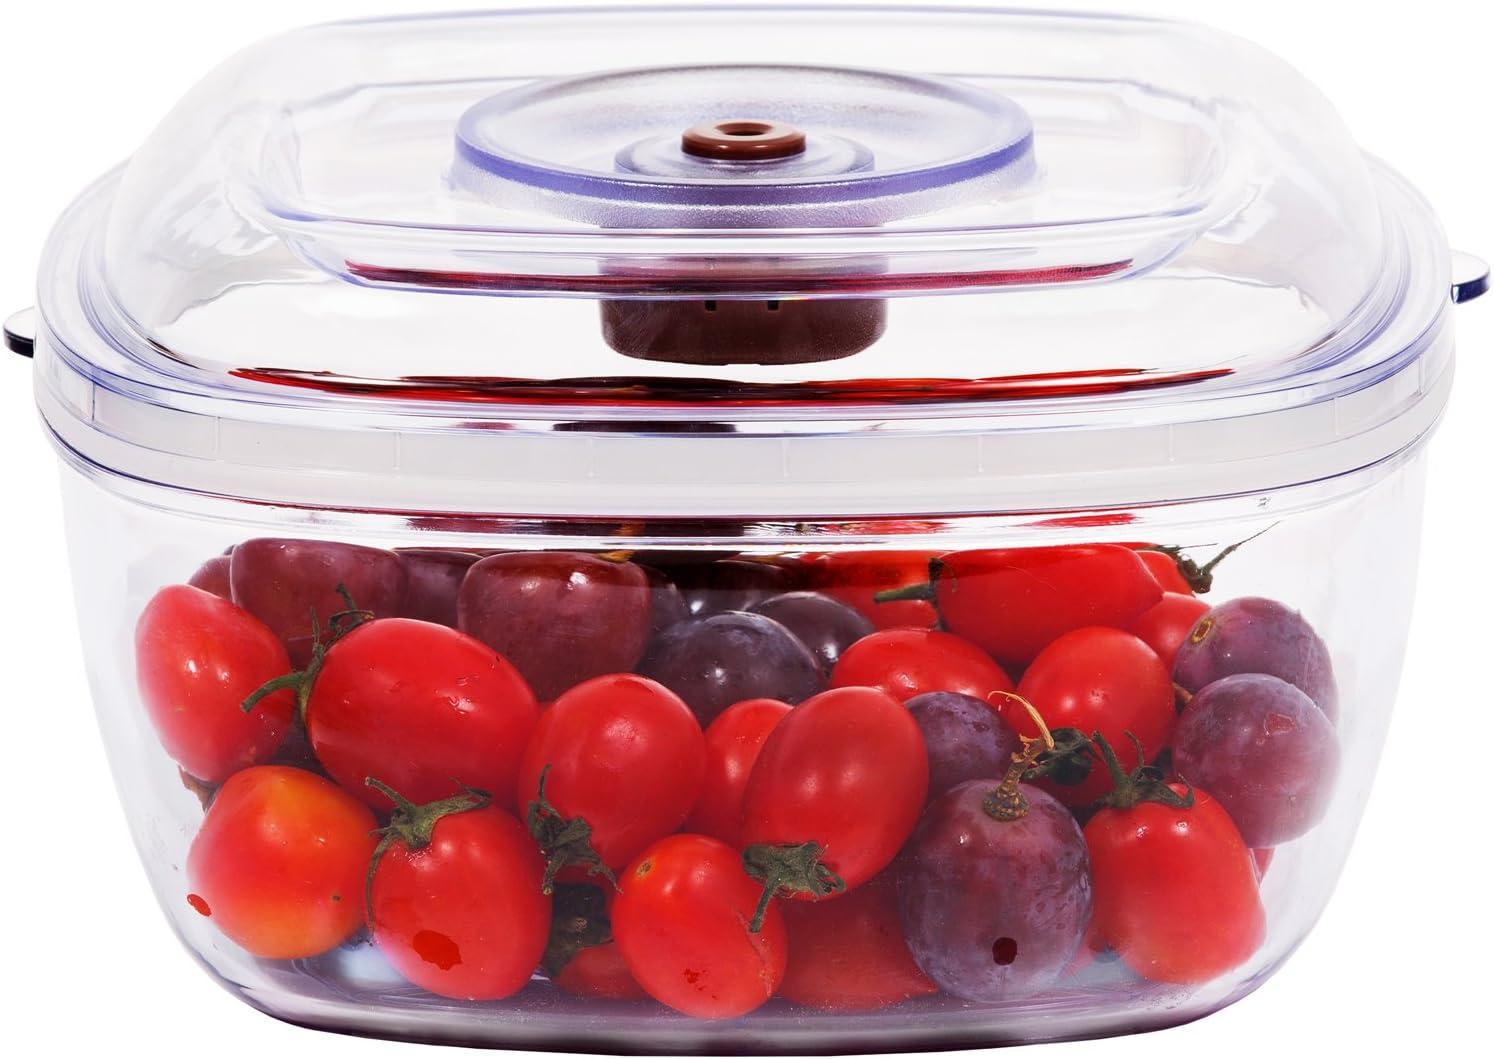 GERYON Vacuum Seal Container for Food Storage Vacuum Sealer Machine with Vacuum Hose for Food Saver, 2.1 QUART(2 LITER)